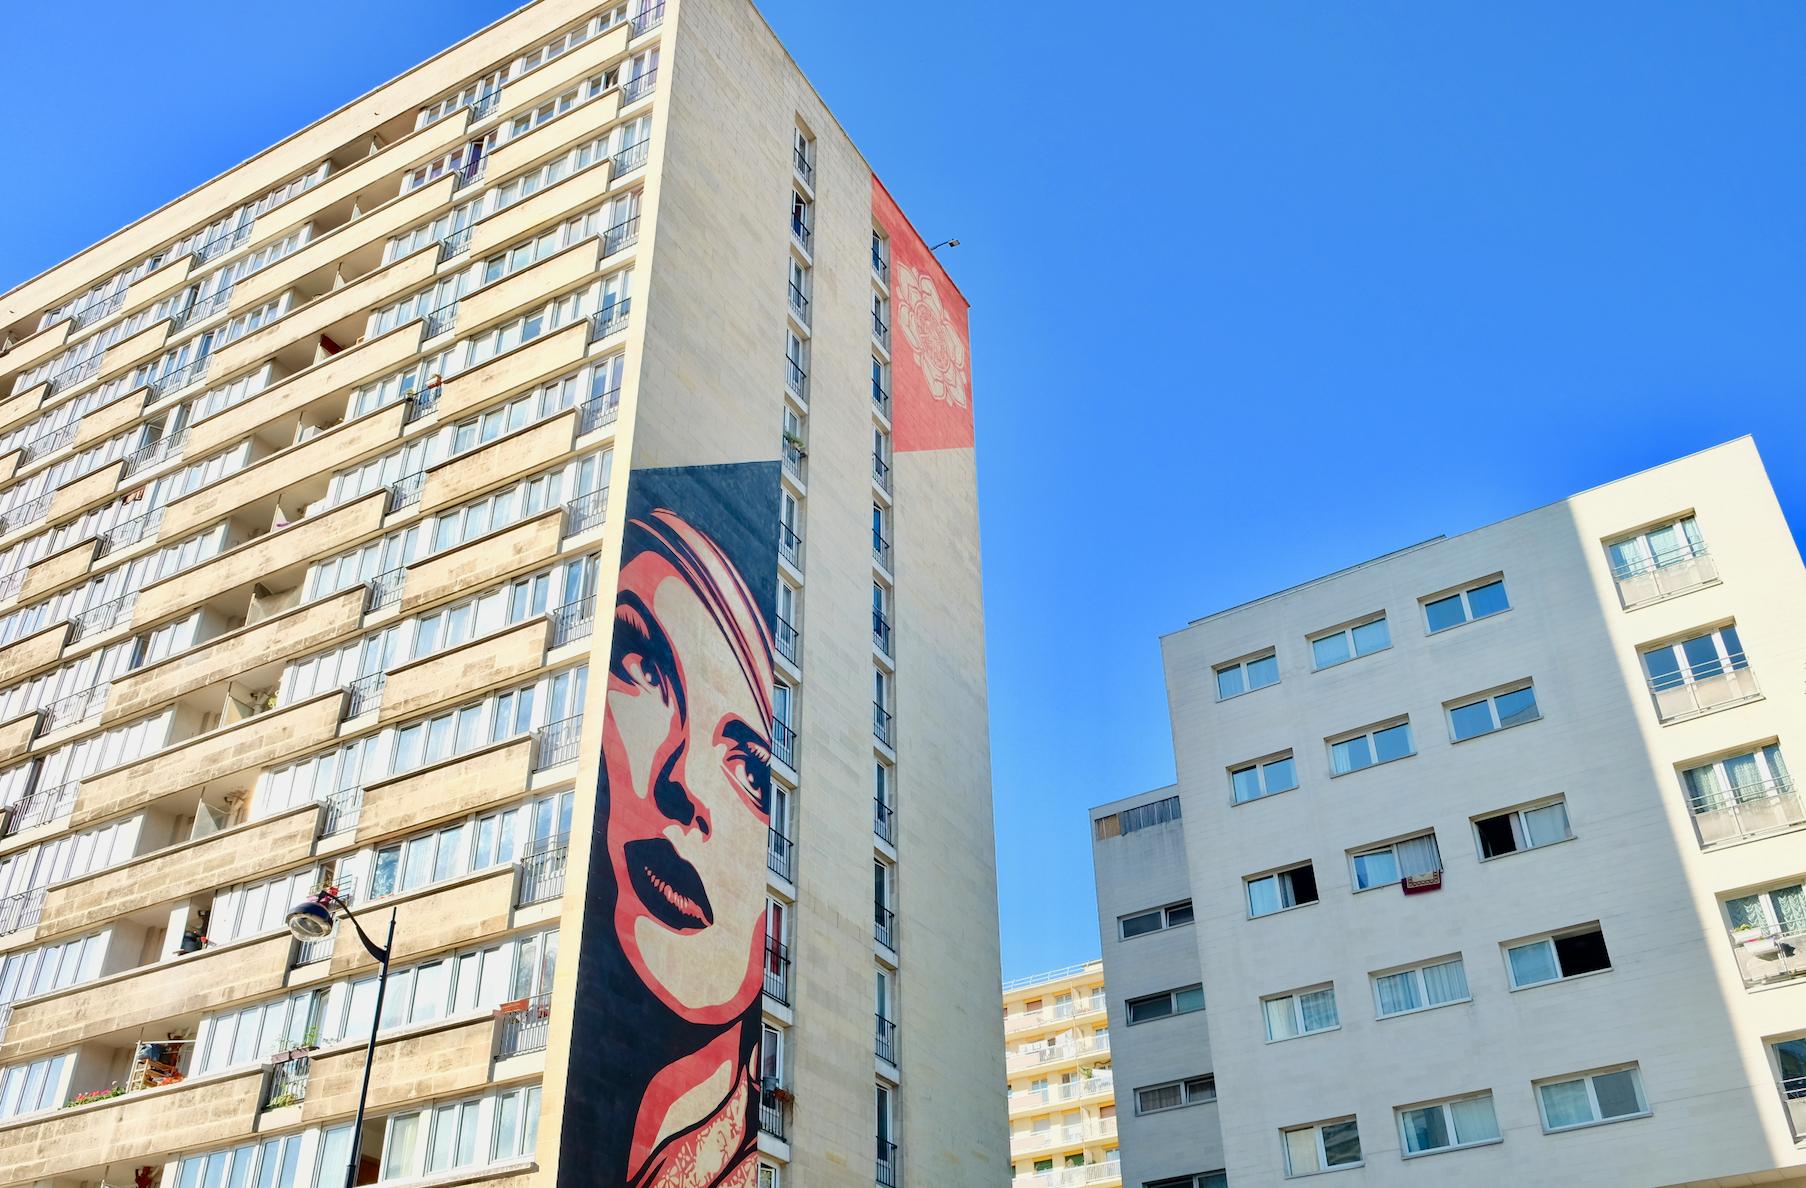 Street art paris 13 Obey Shepard Fairey